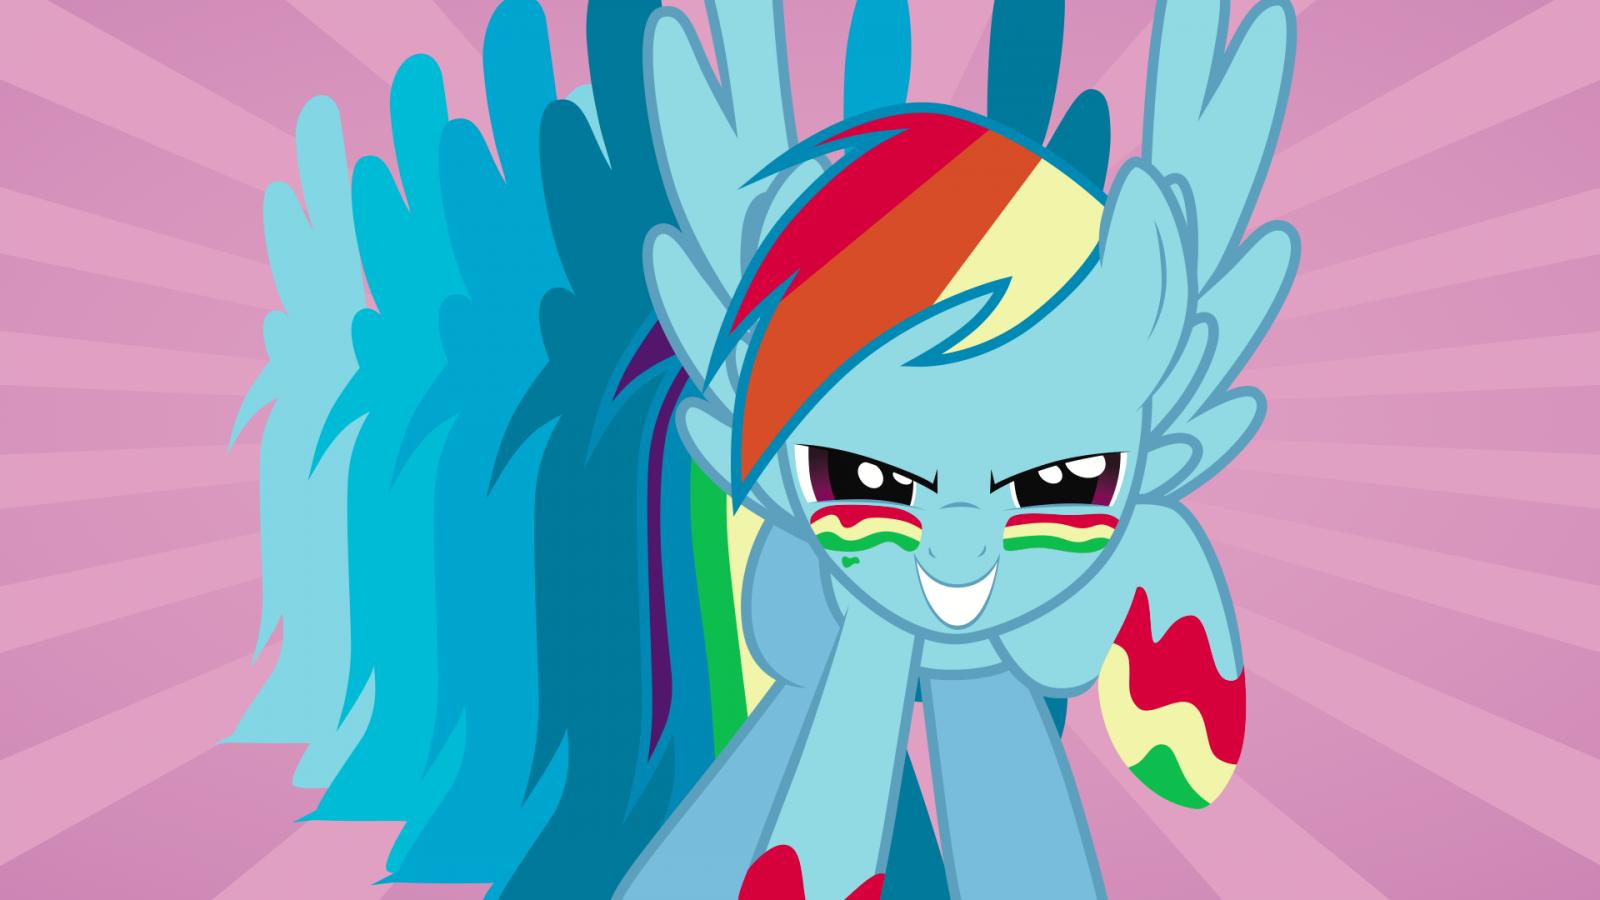 Free Download My Little Pony Rainbow Dash Wallpaper 1920x1080